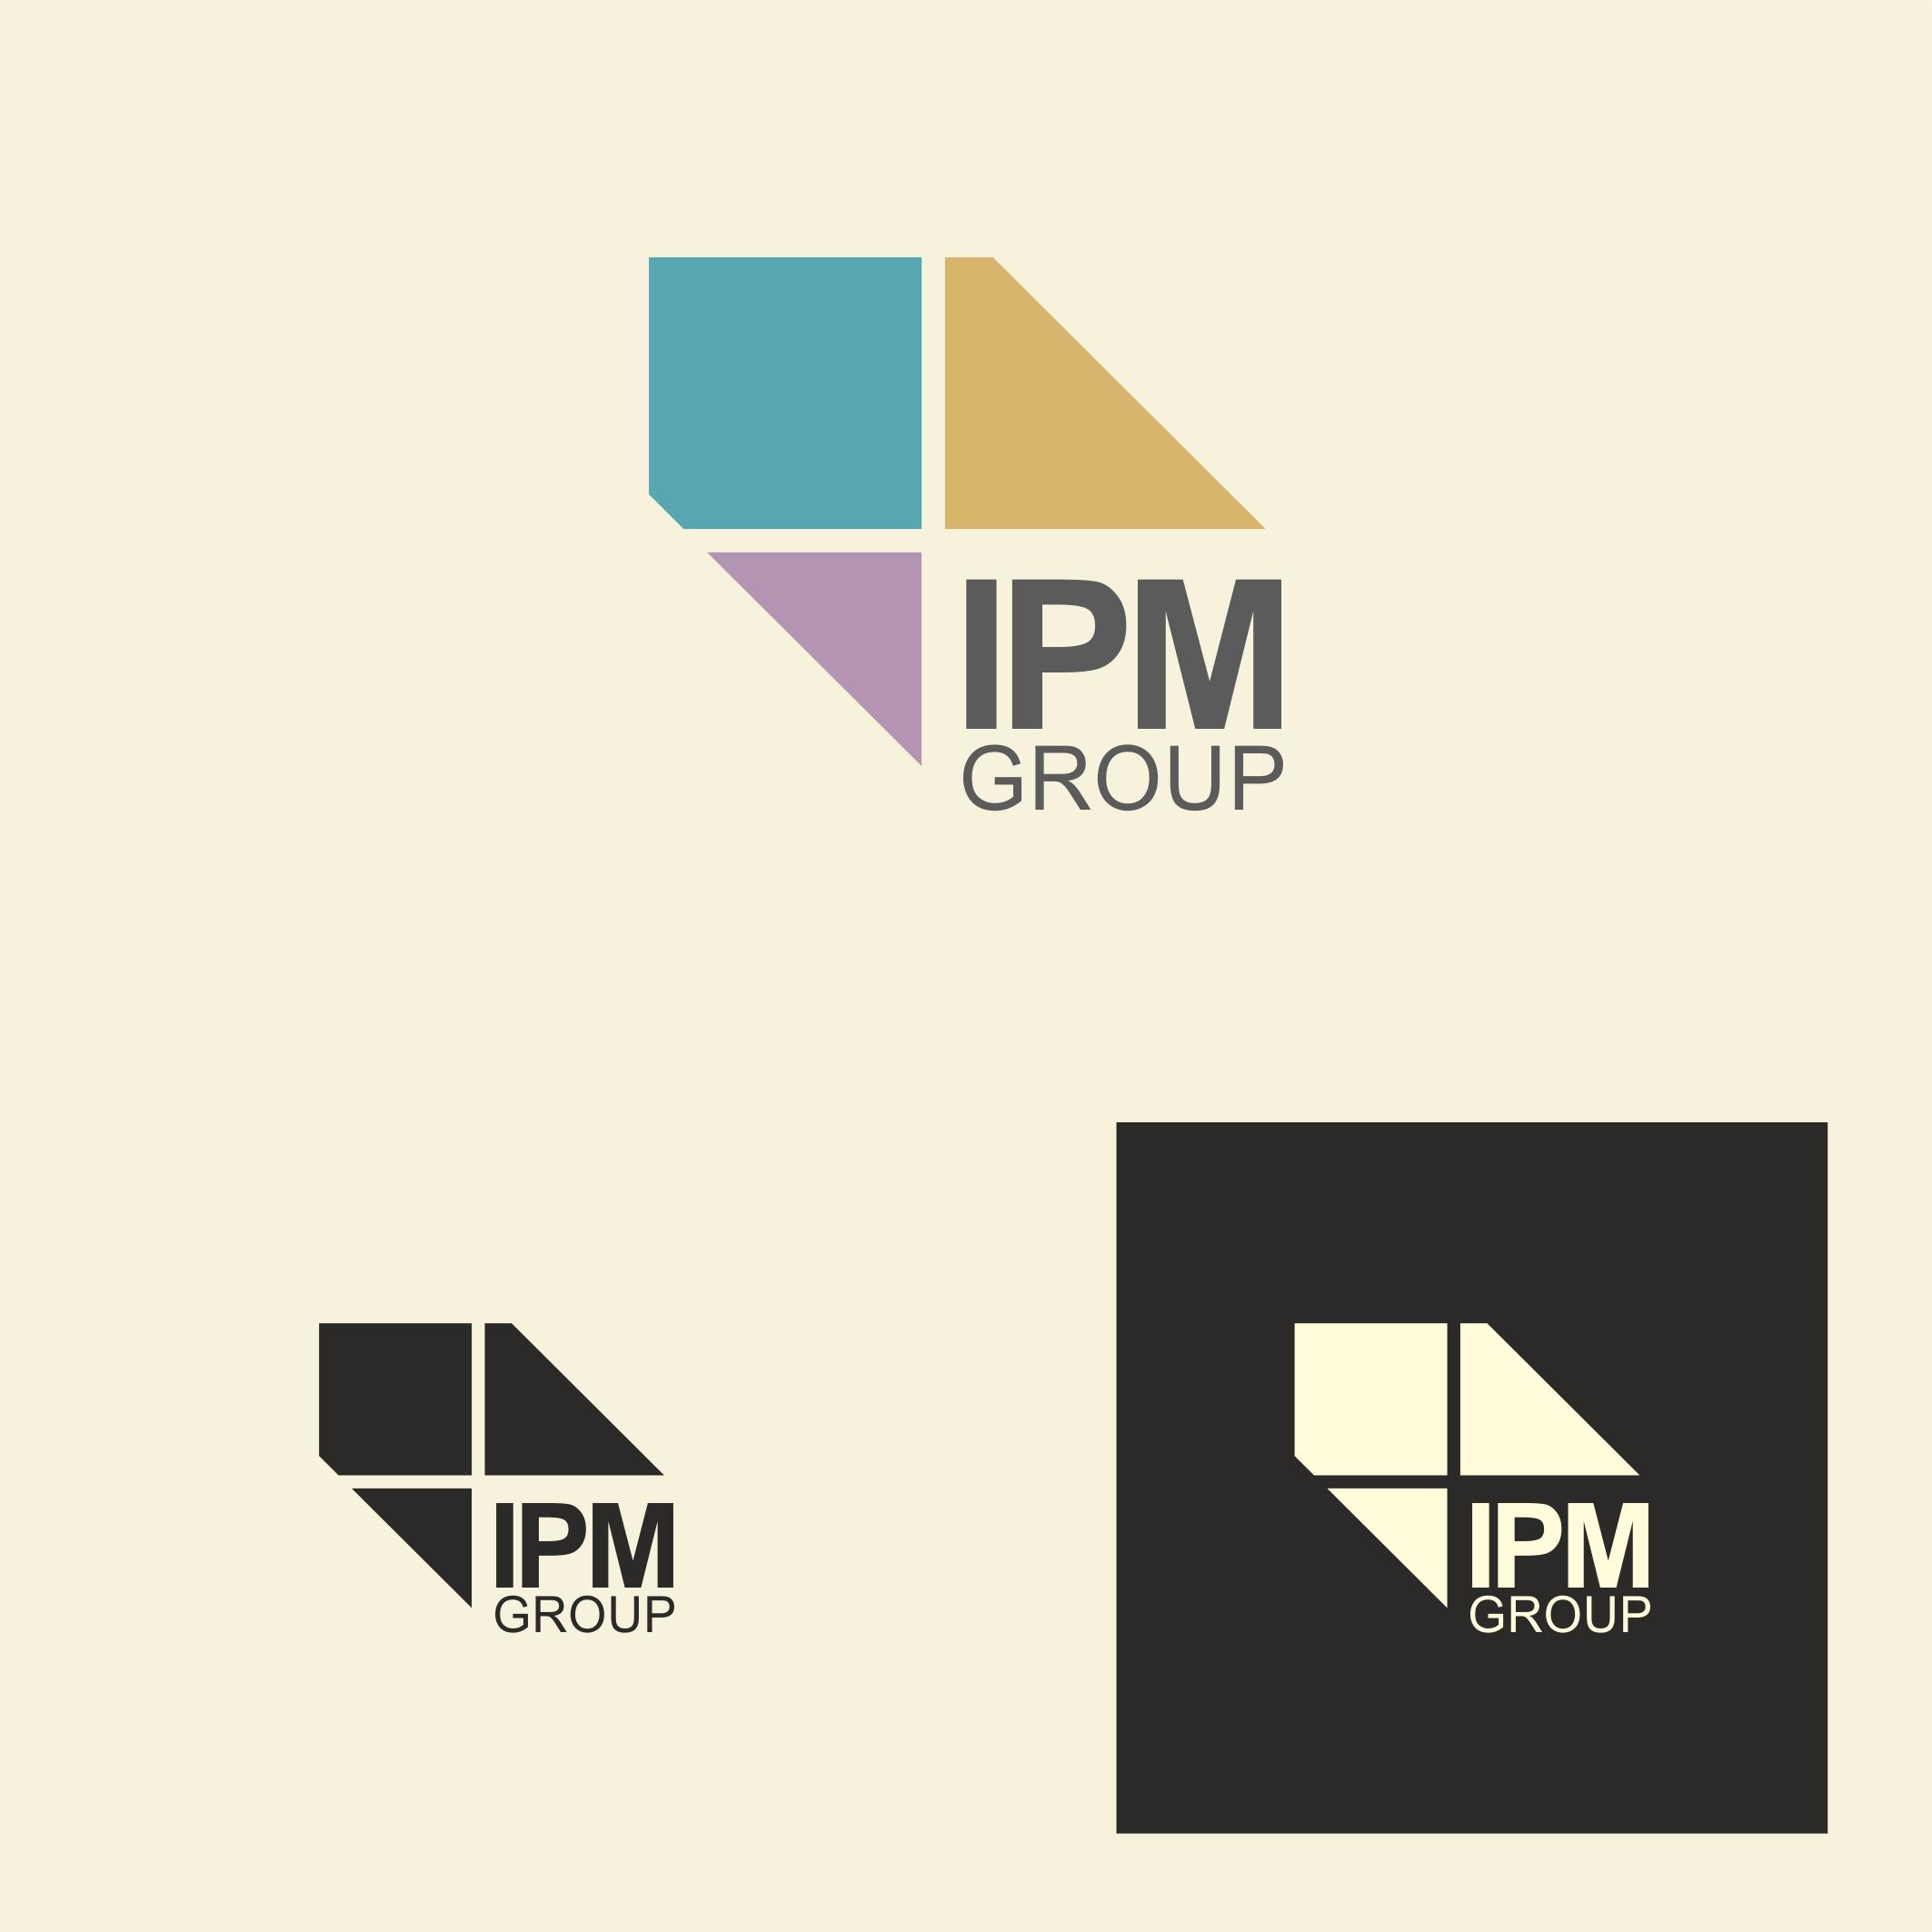 Разработка логотипа для управляющей компании фото f_6675f8373e99028c.jpg